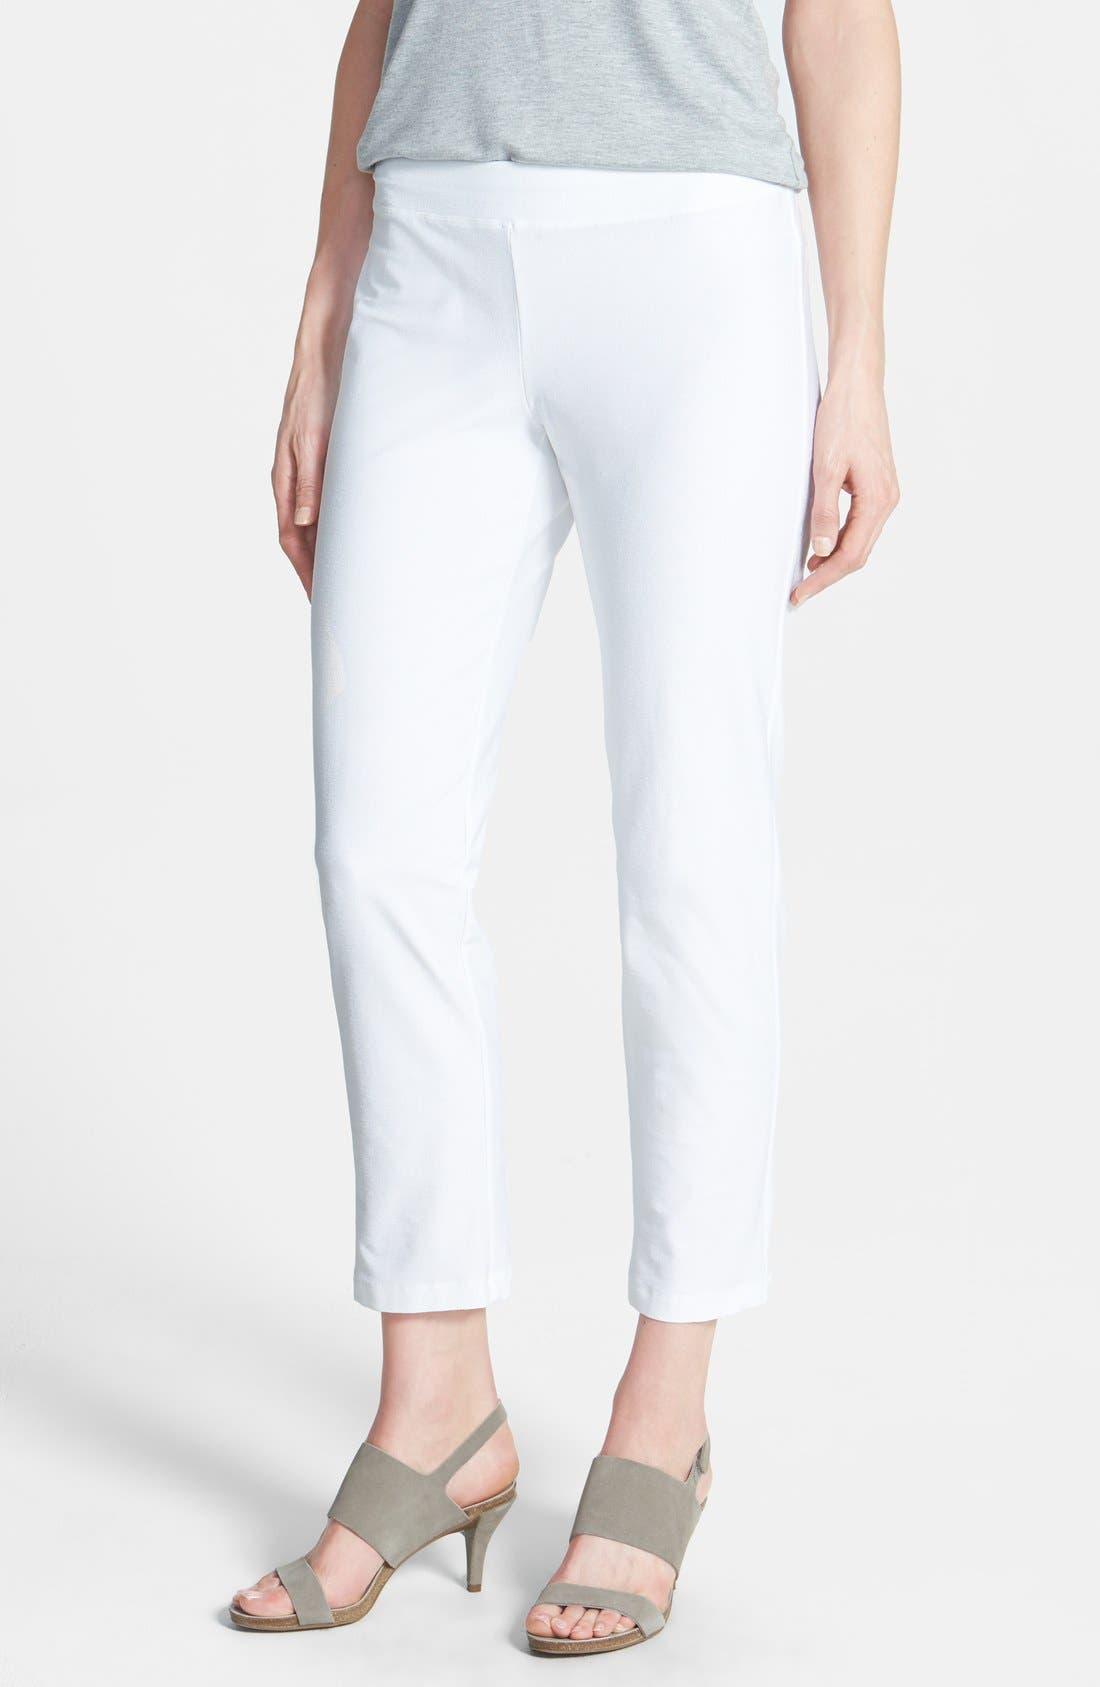 Alternate Image 1 Selected - Eileen Fisher Slim Ankle Pants (Regular & Petite)